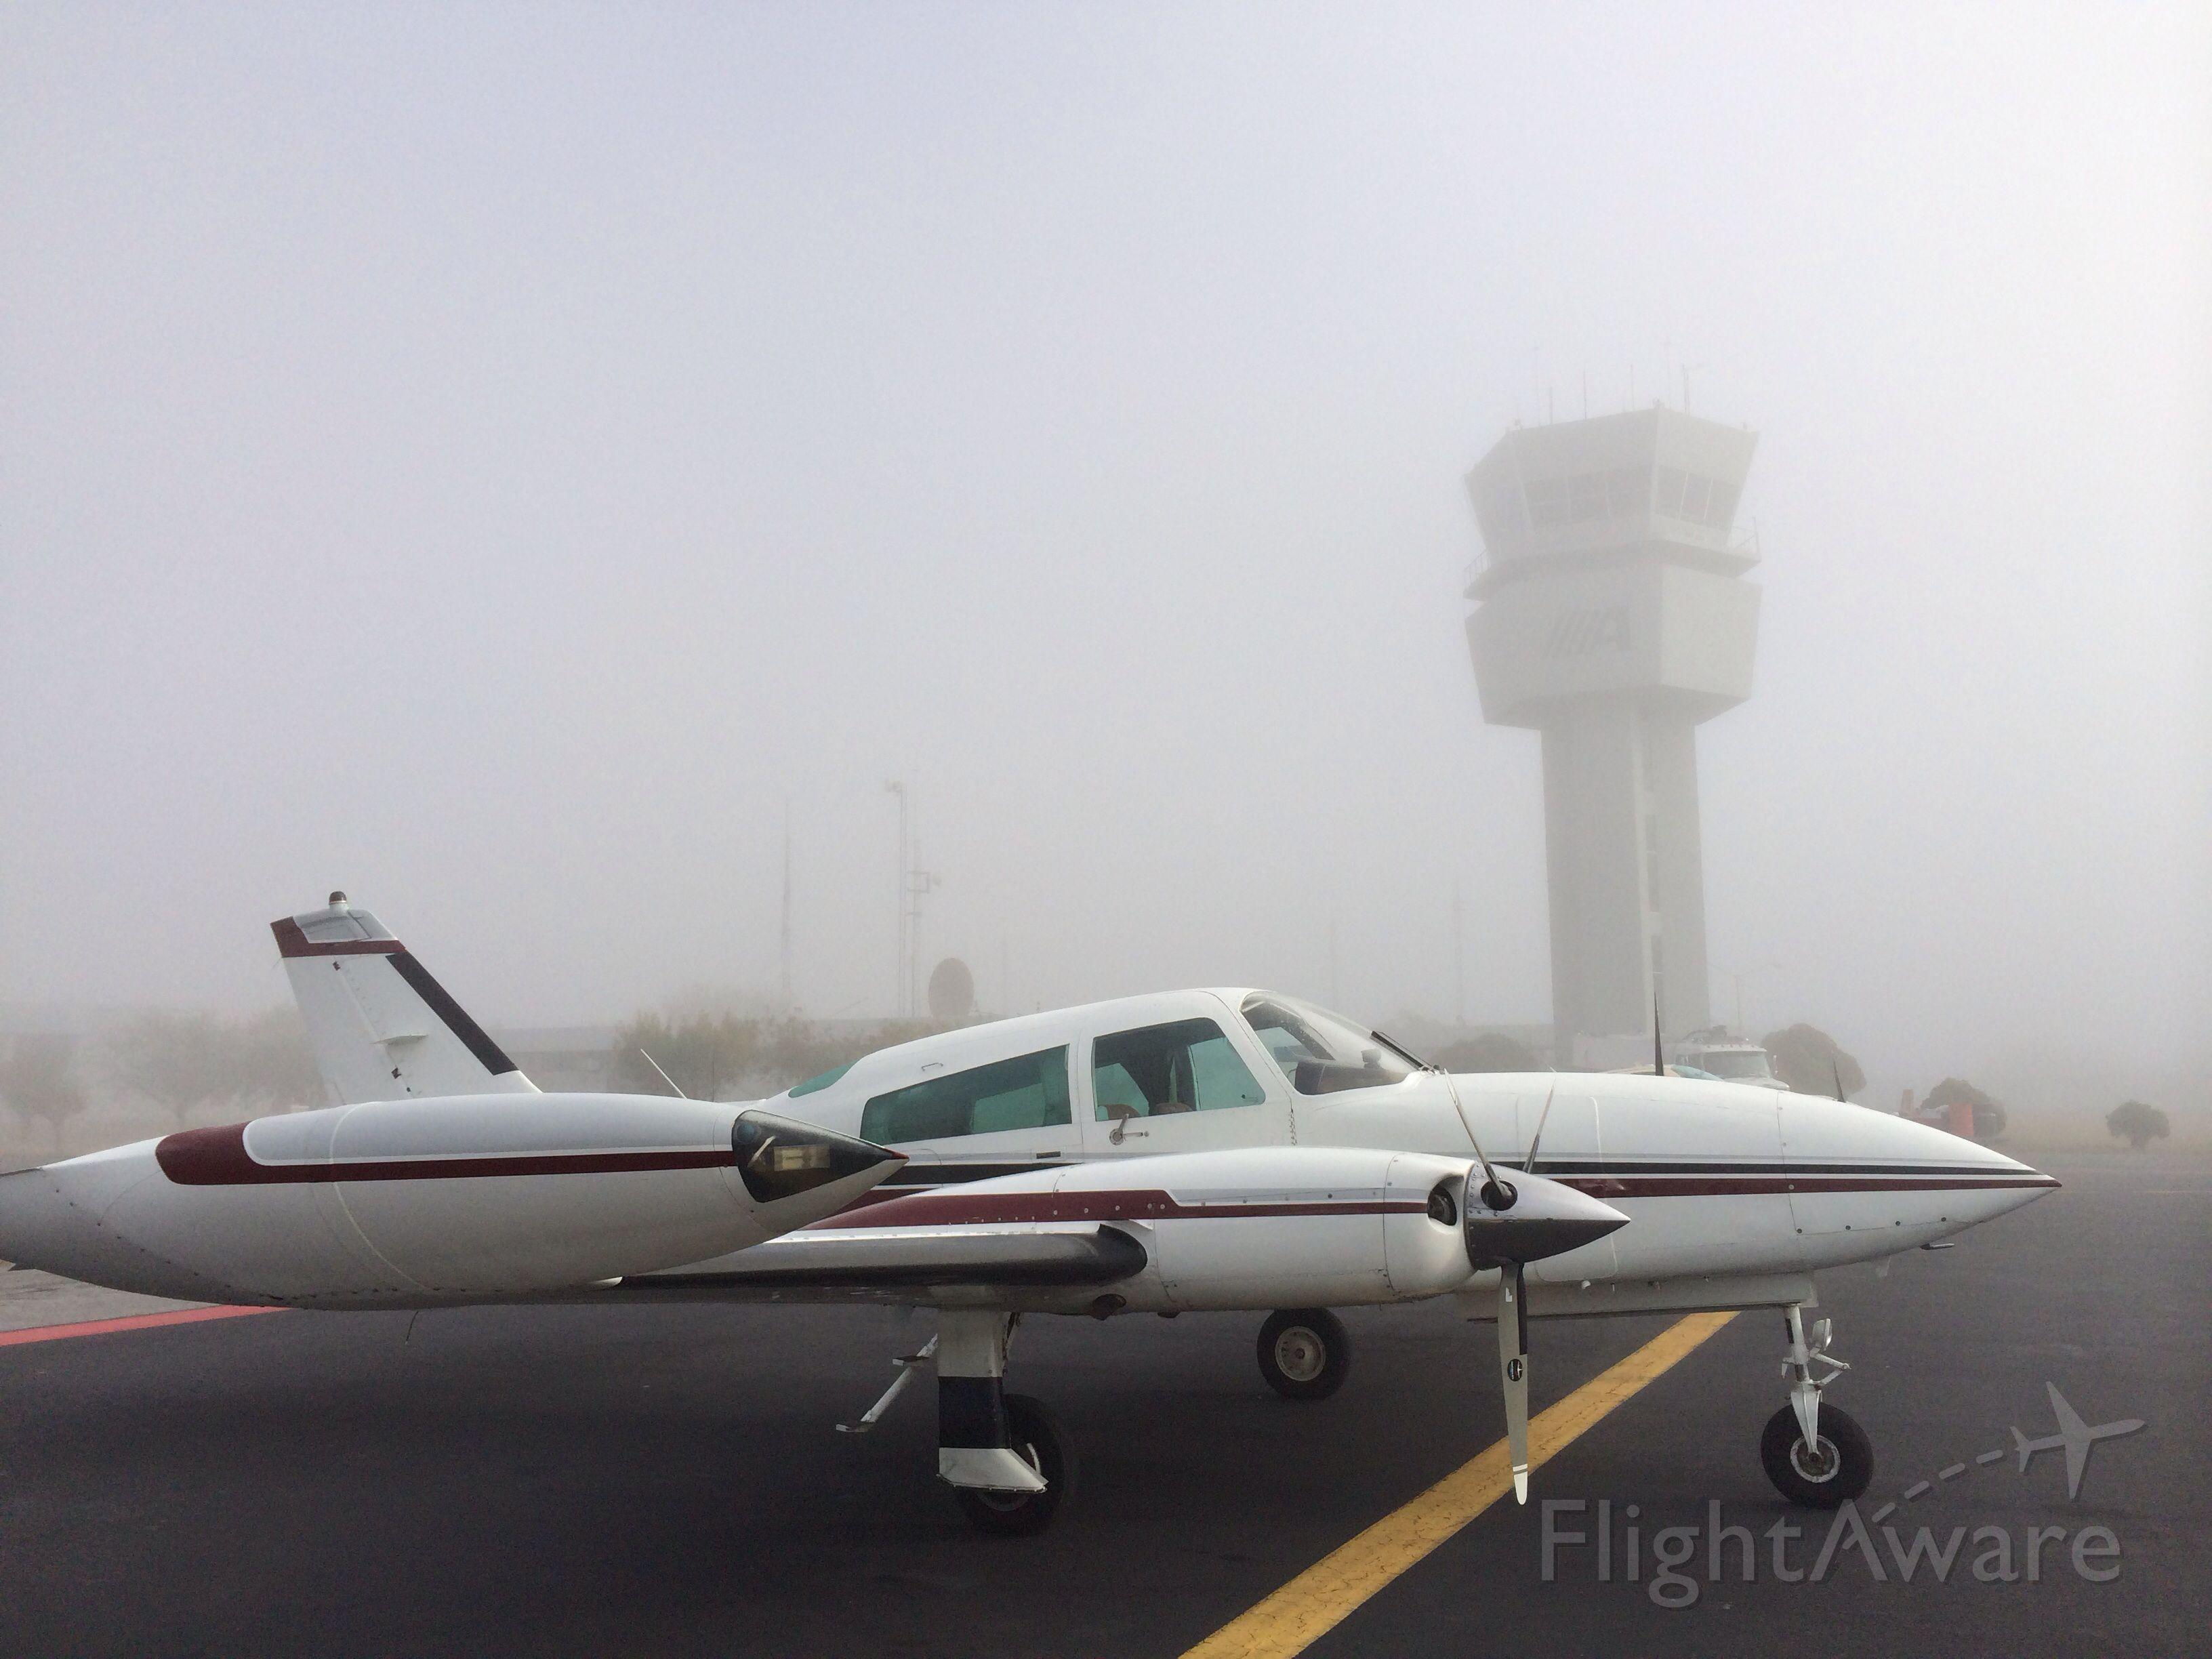 Cessna 310 (N400DP) - Fogged in in Ciudad Victoria, Tamaulipas, Mexico